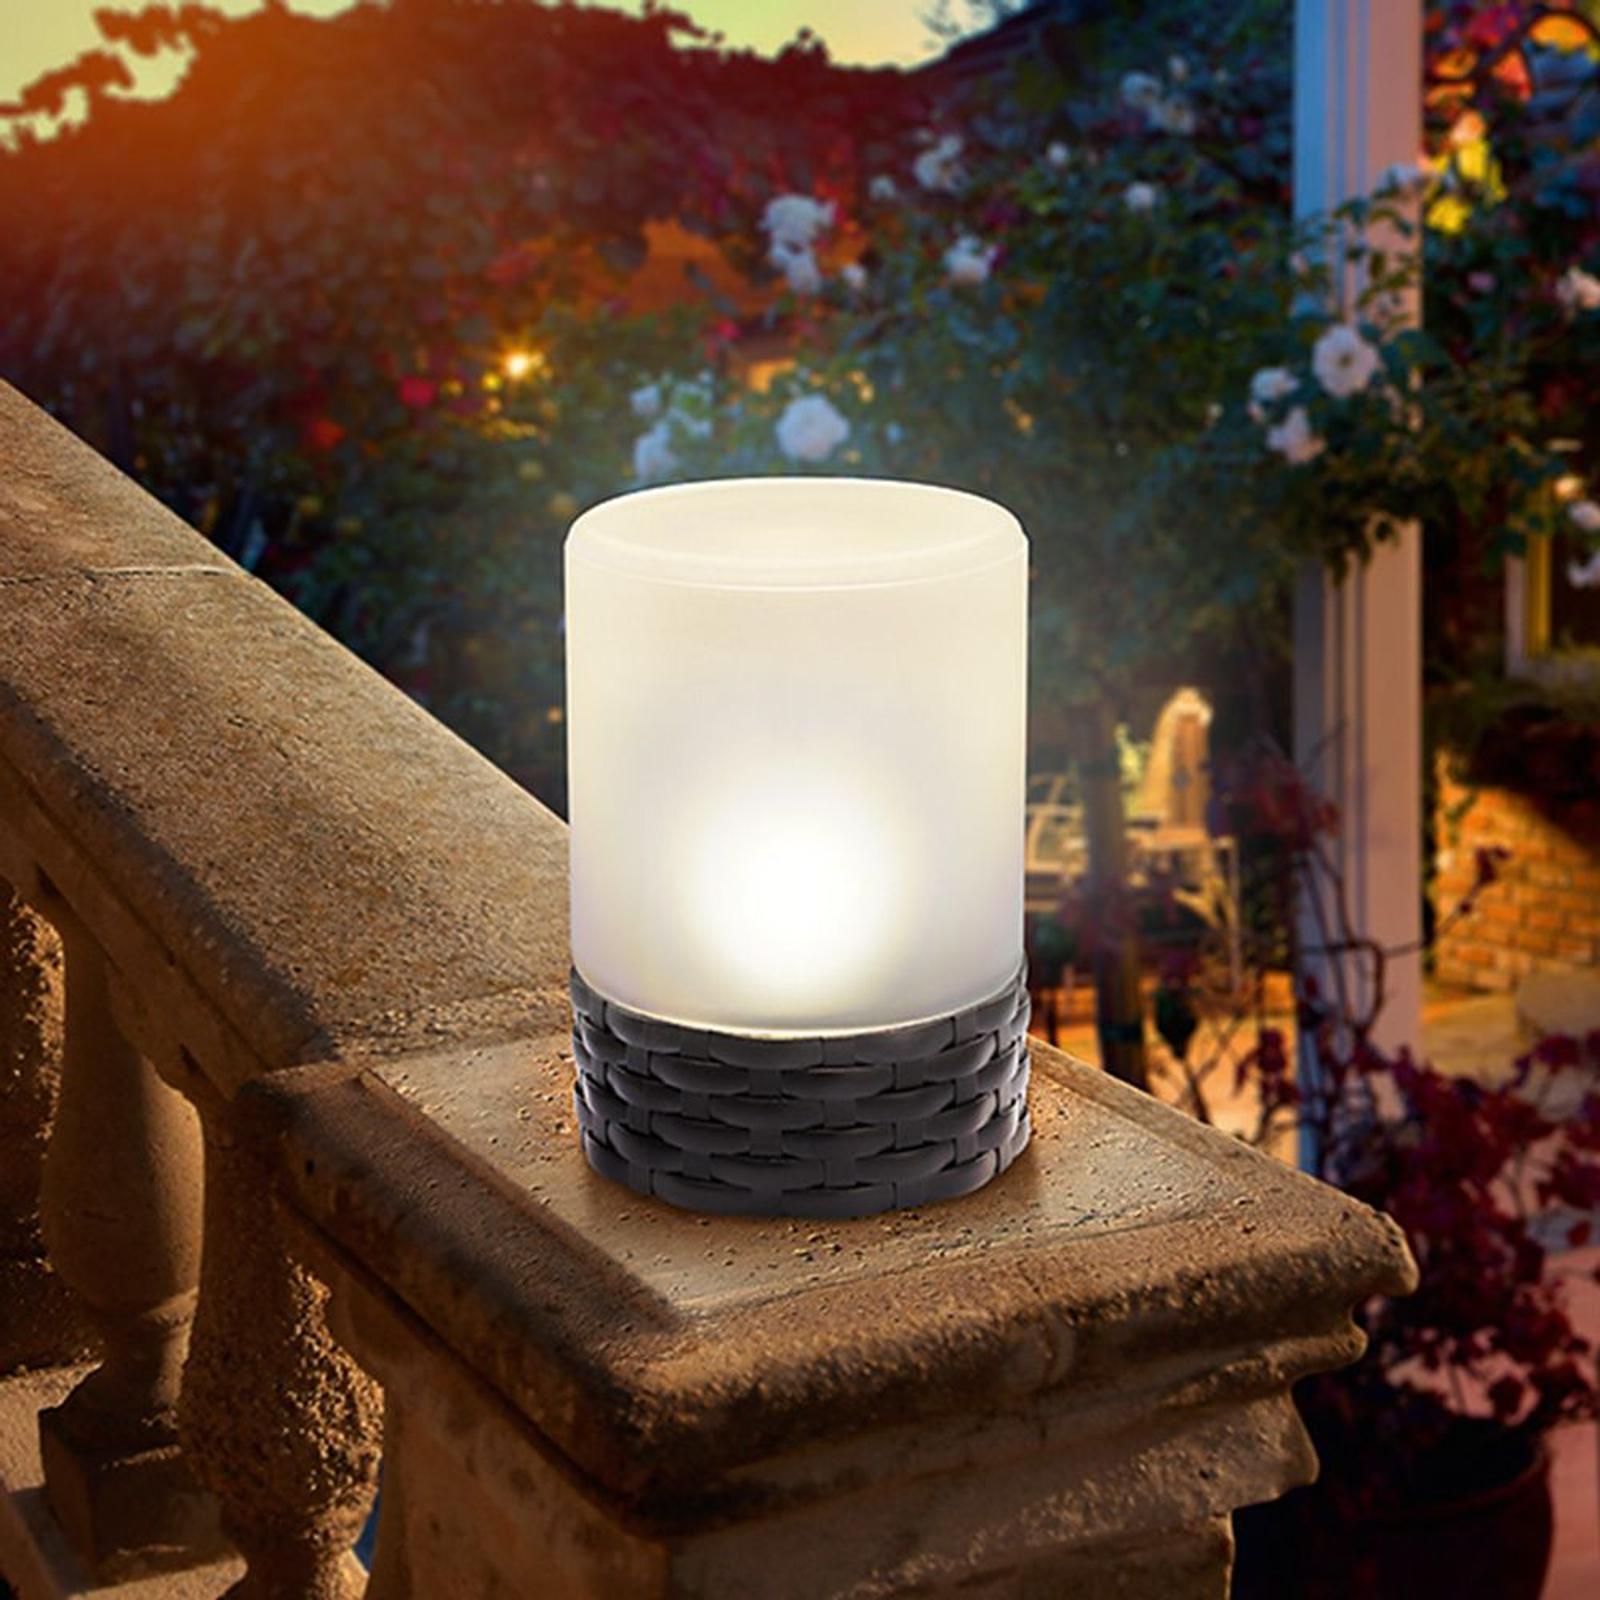 Cloe - LED-solcellslampa i trendig rotting-stil